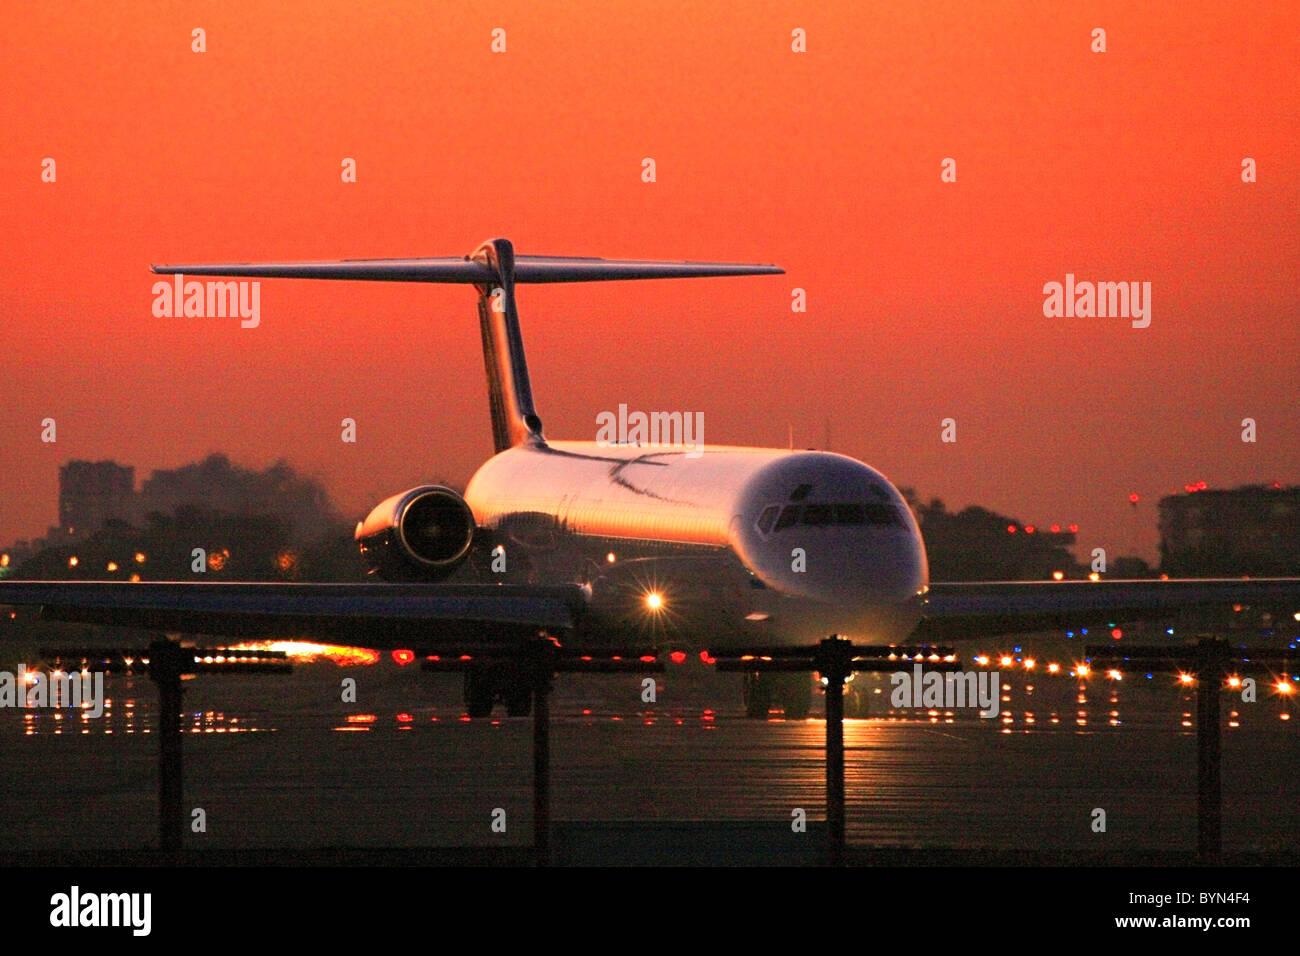 Turbo Jet kommerziellen Flugzeug anreisen Jorge Newbery Flughafen bei Sonnenuntergang. Stockbild